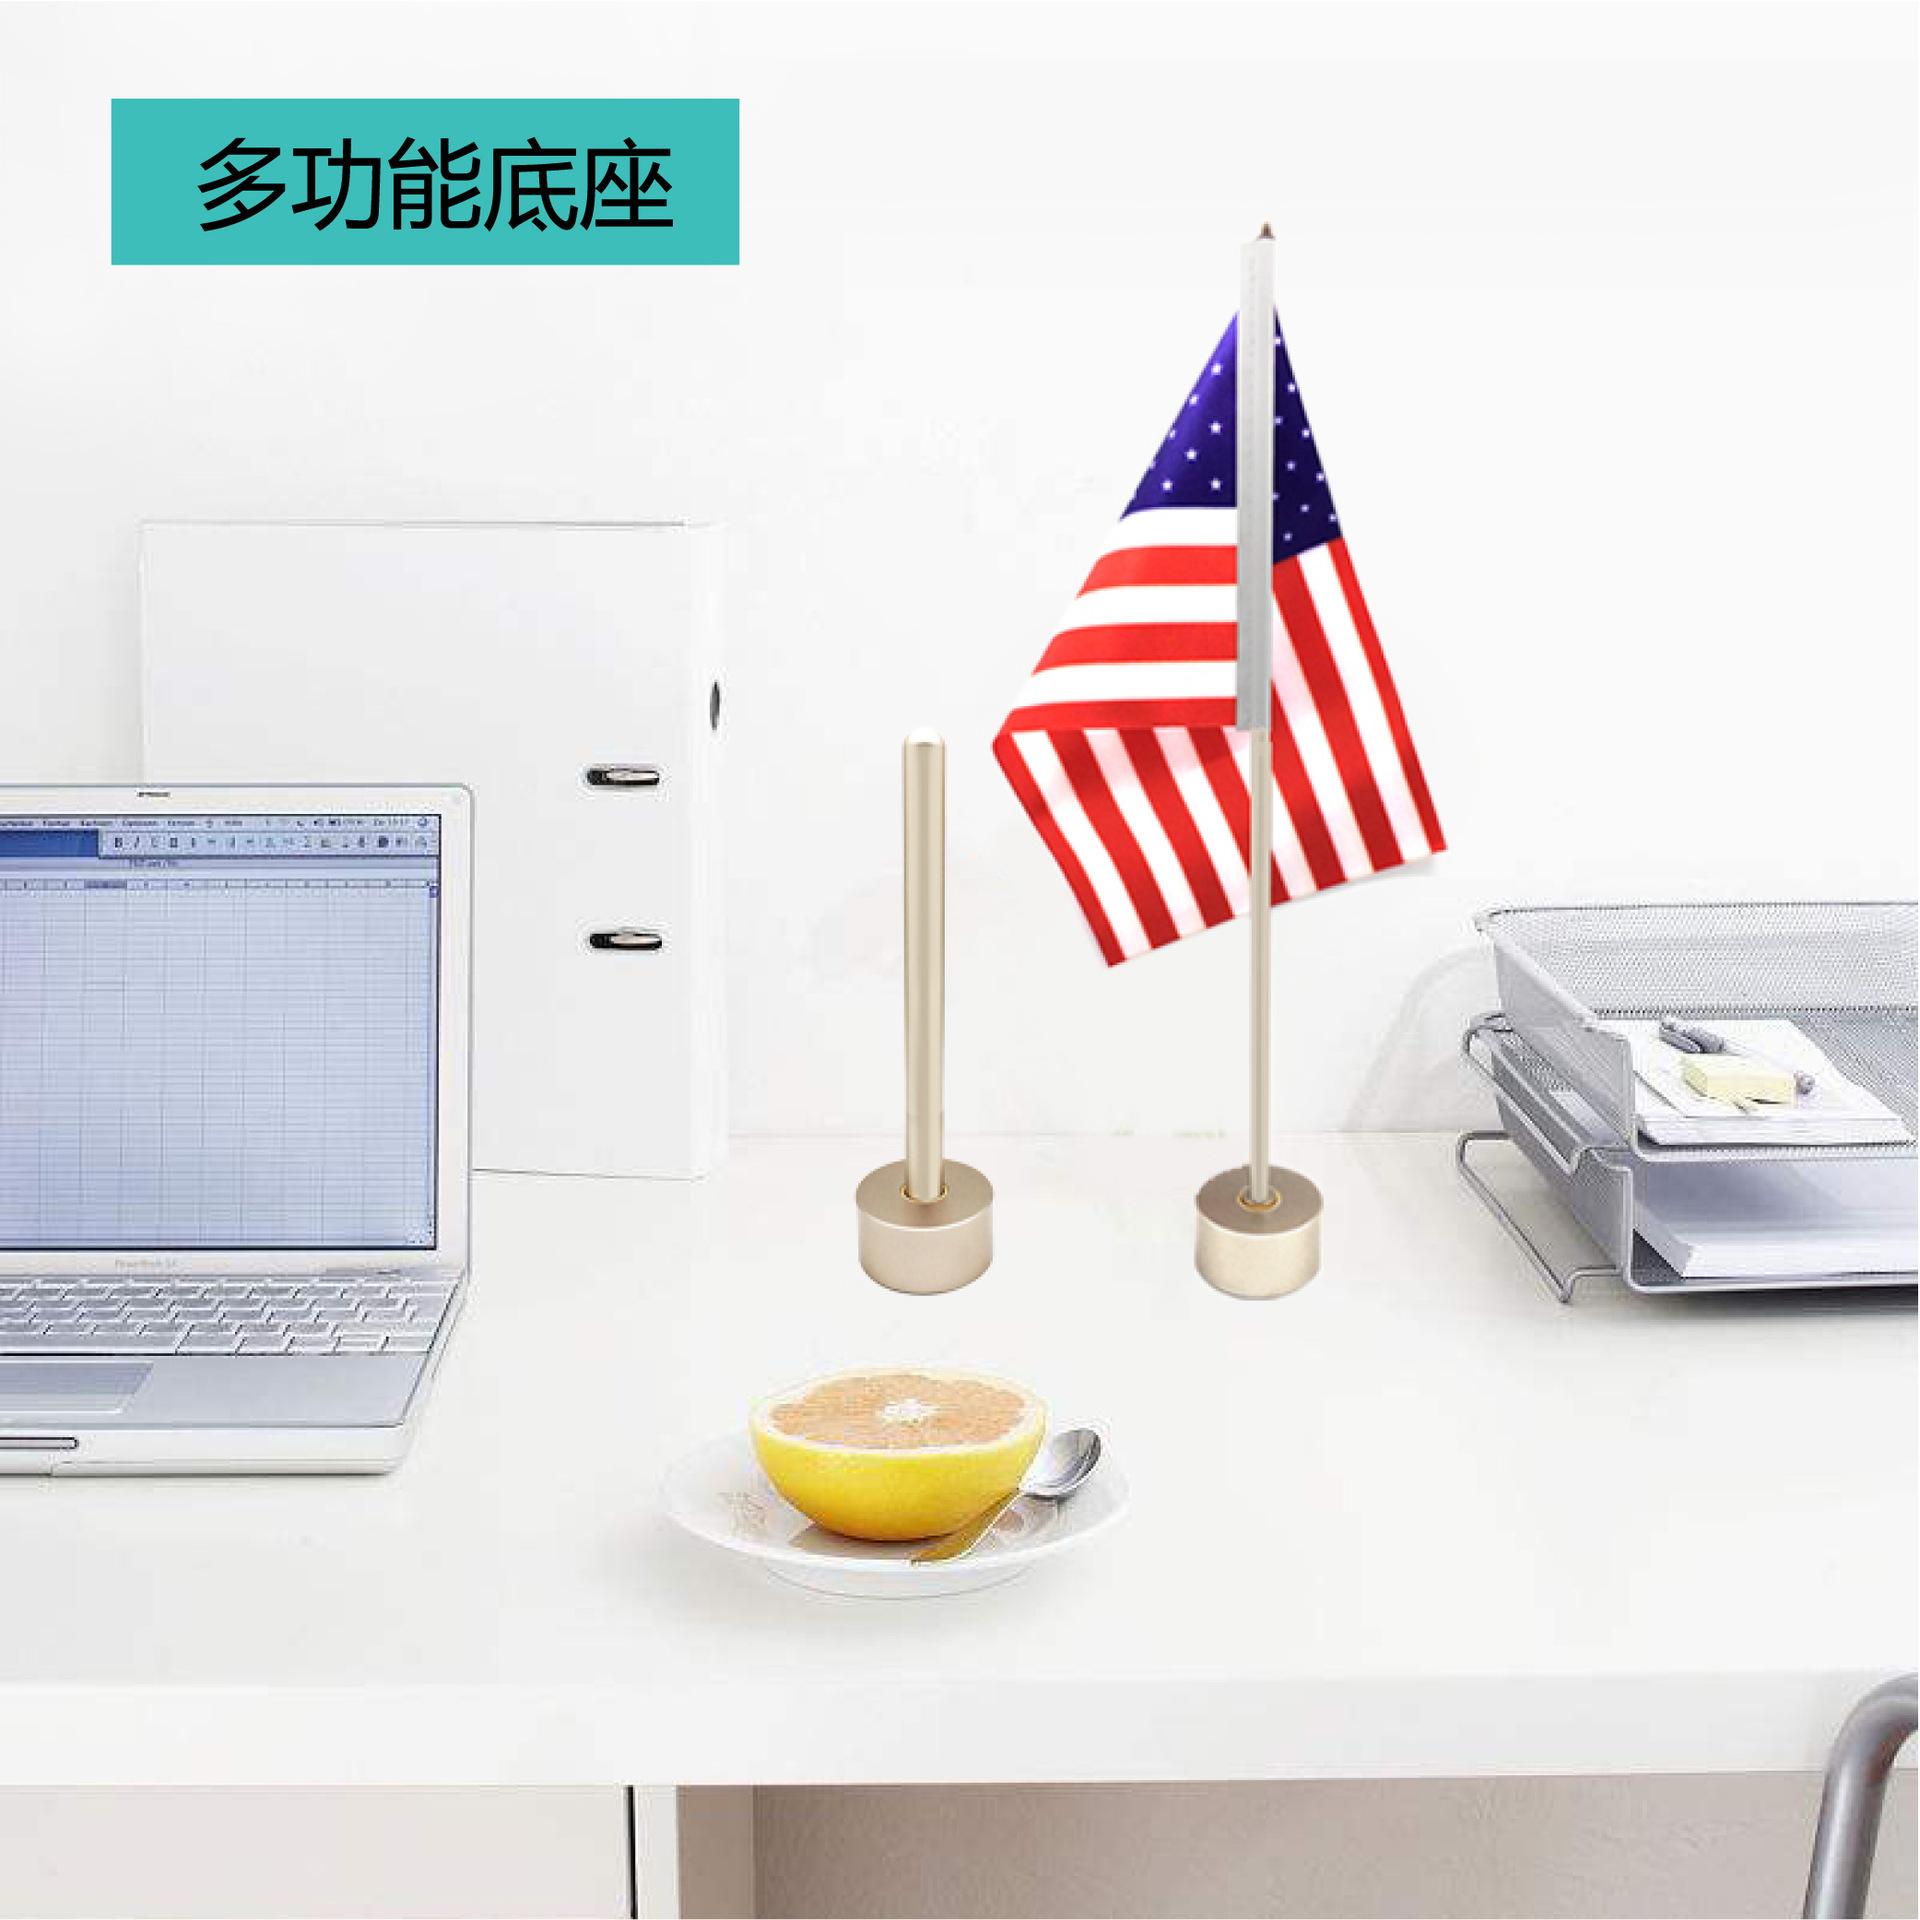 Admirable 2018 New Model Customized Colors Taiwan Office Stationery Metal Desk Pen Finished Glossy Mirror Light Matte Desk Flag Holder Buy New Model Desk Home Remodeling Inspirations Basidirectenergyitoicom